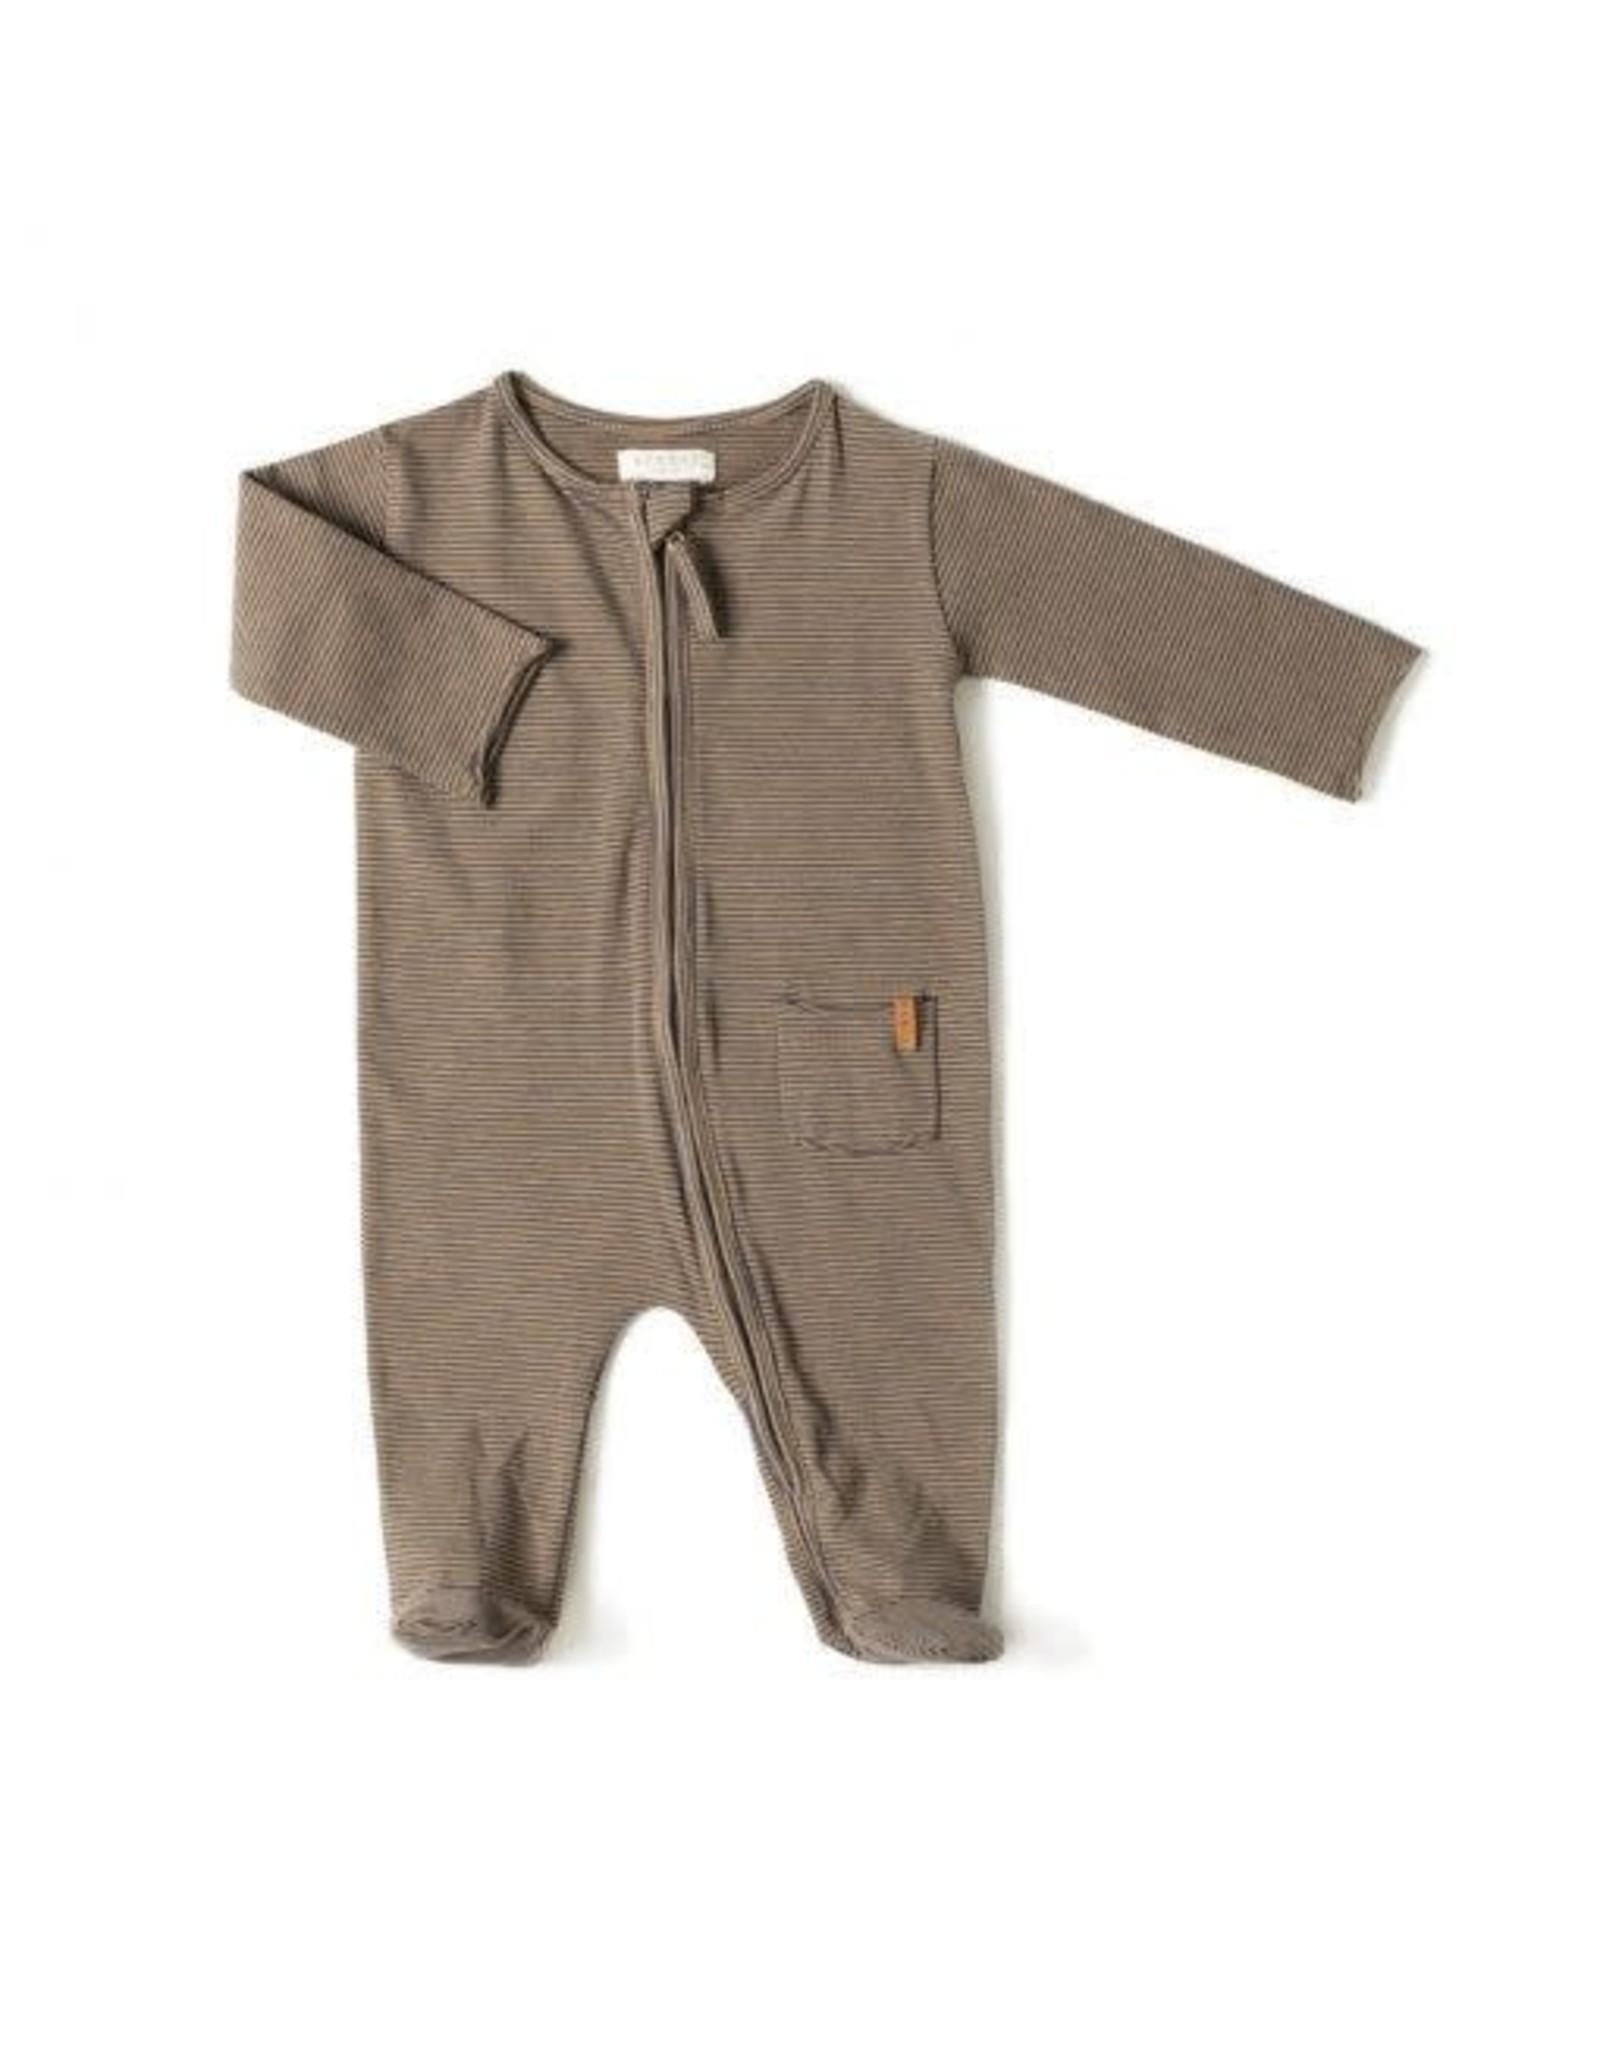 Nixnut Zip onesie Olive stripe